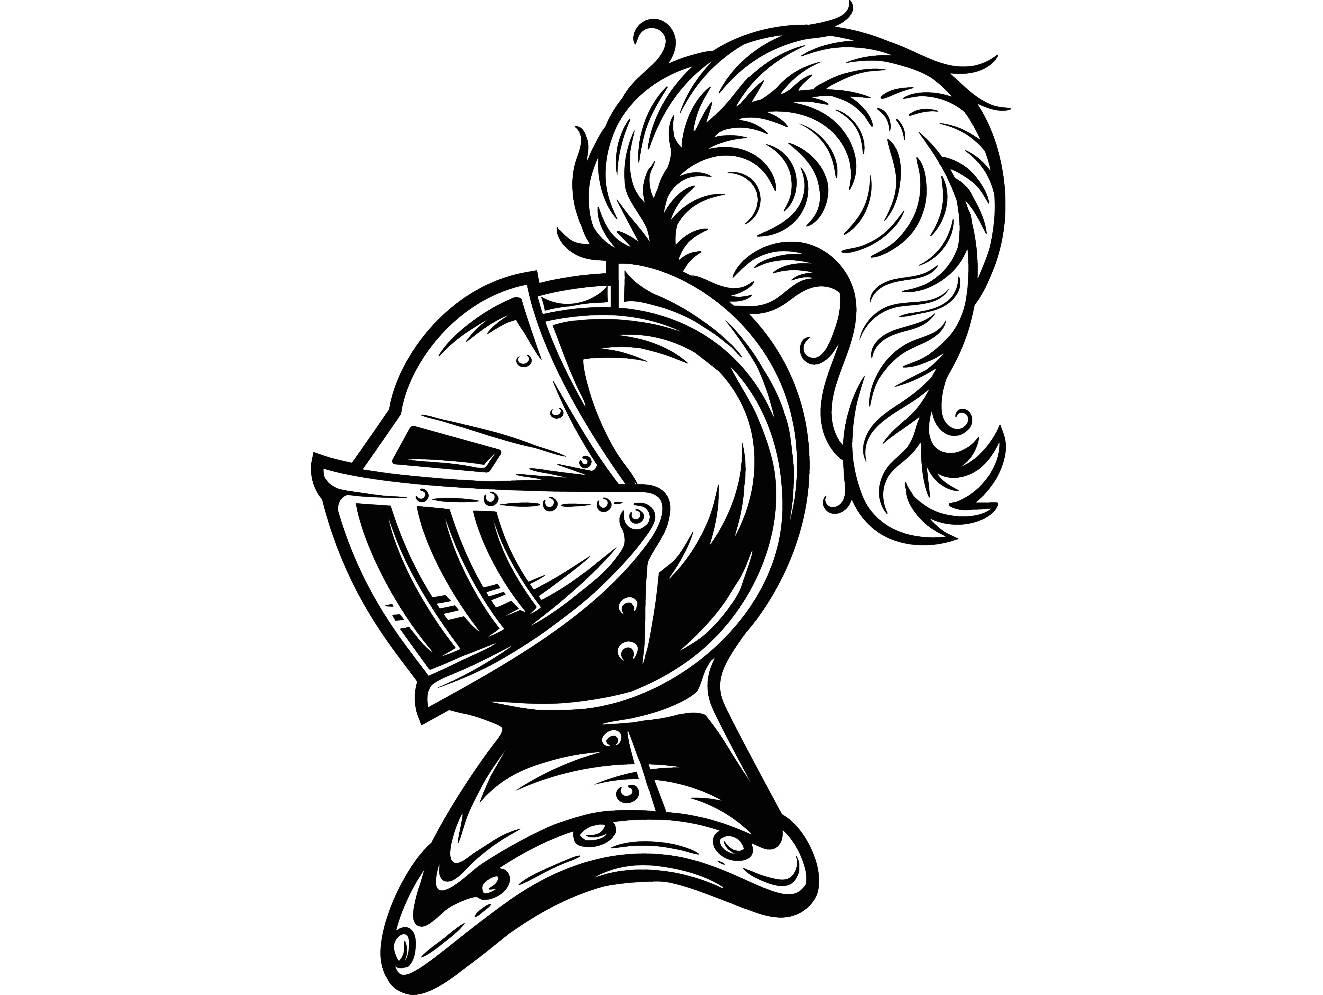 Knight 8 Metal Armor Helmet Feather Sword Monarch Military